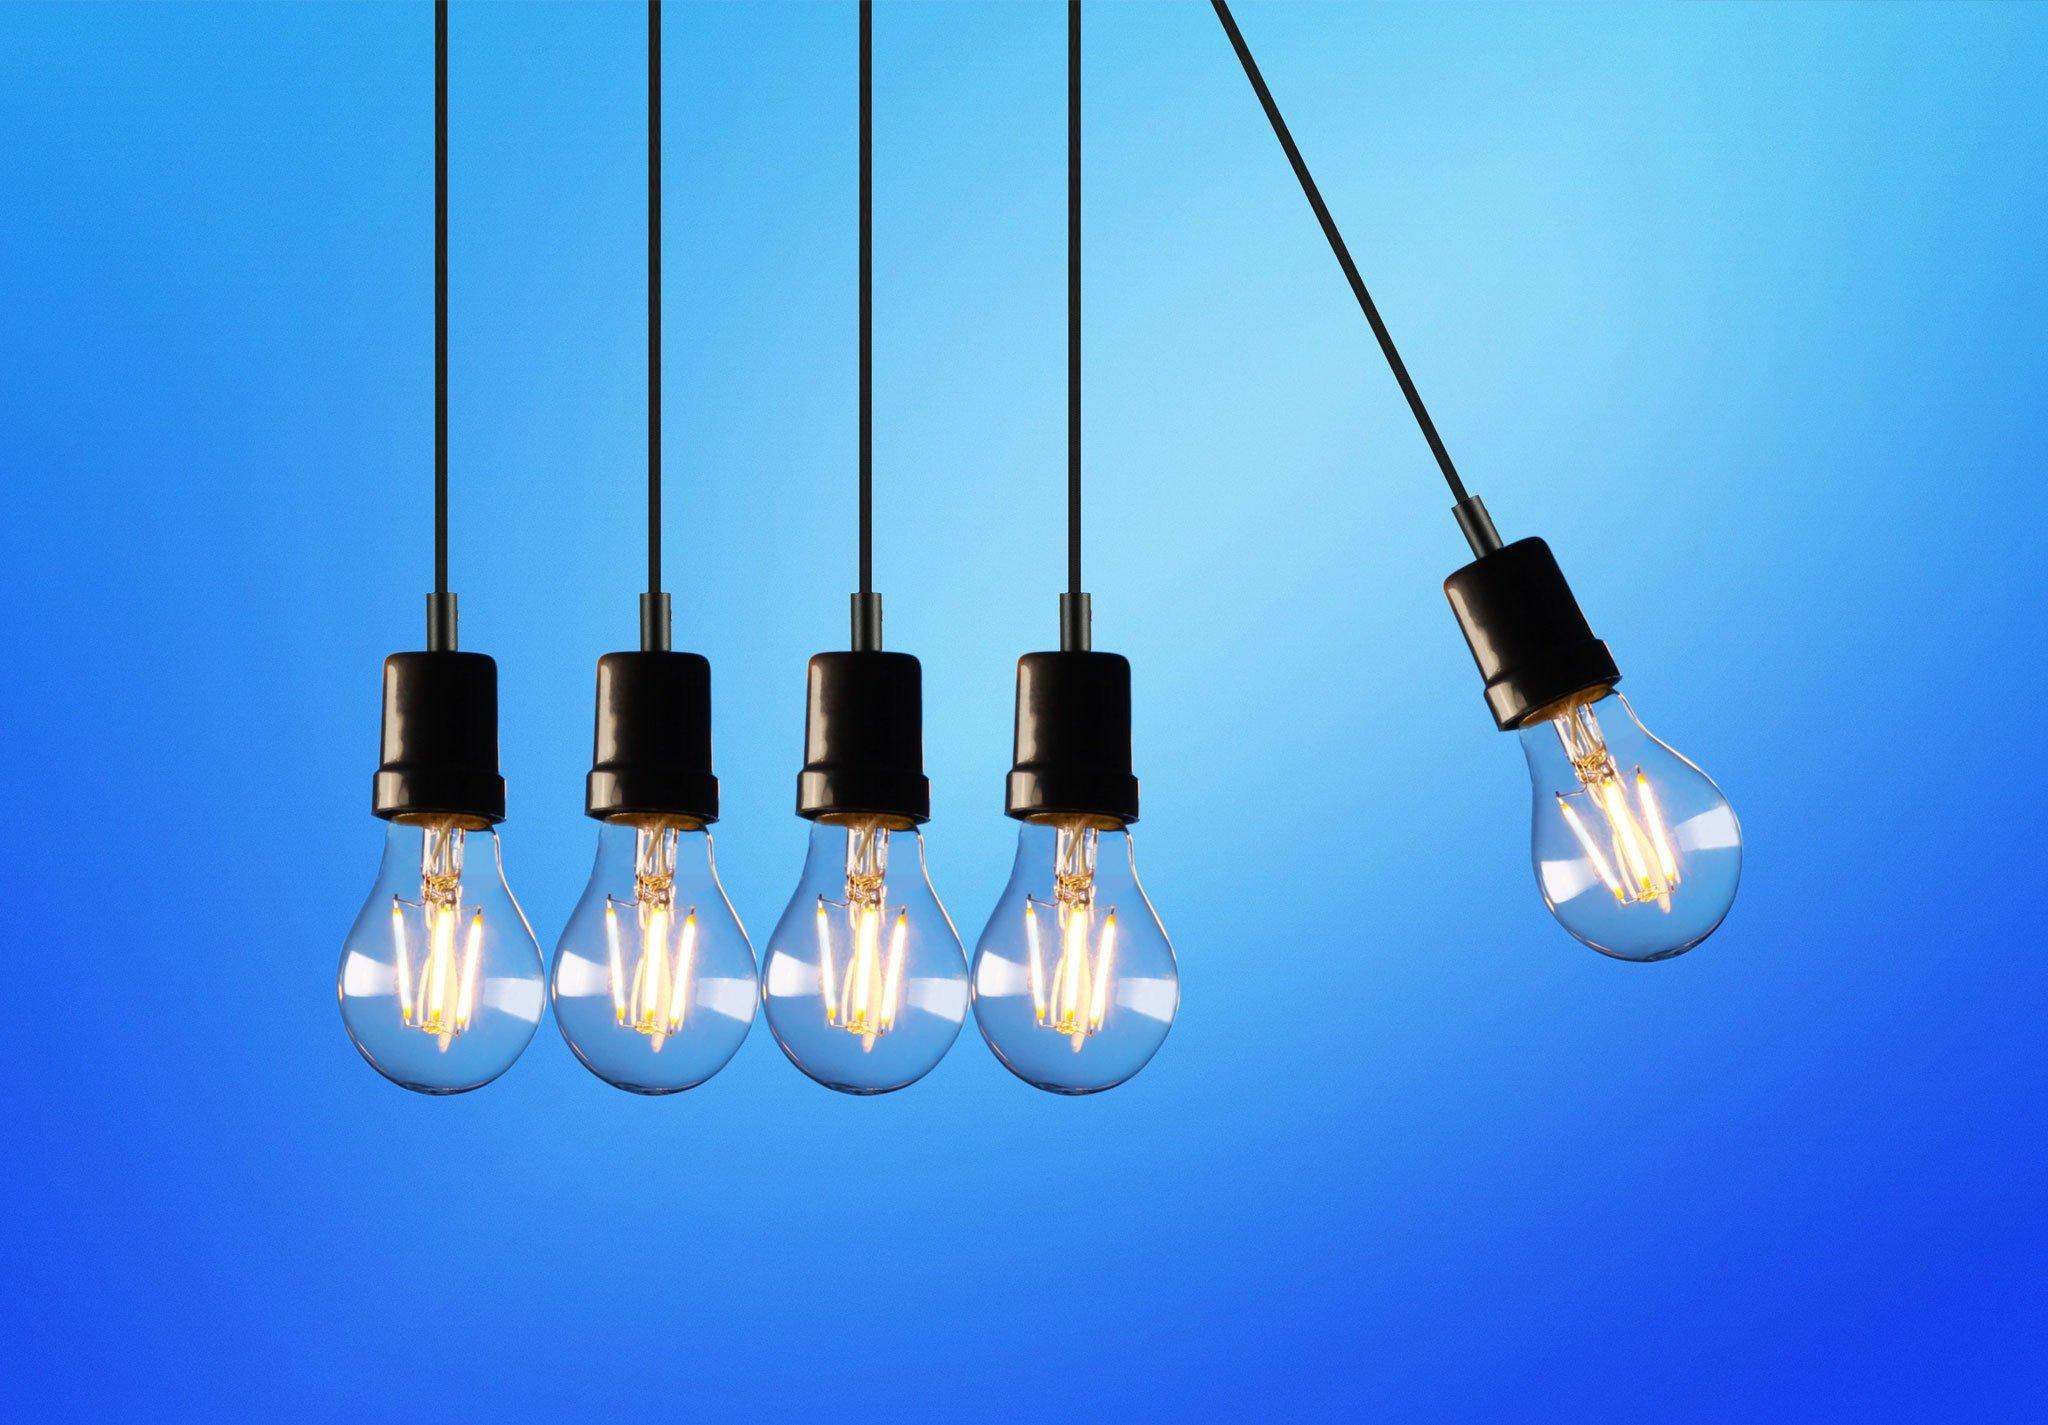 Idea bulb imagery for entrepreneur and creativity blog post